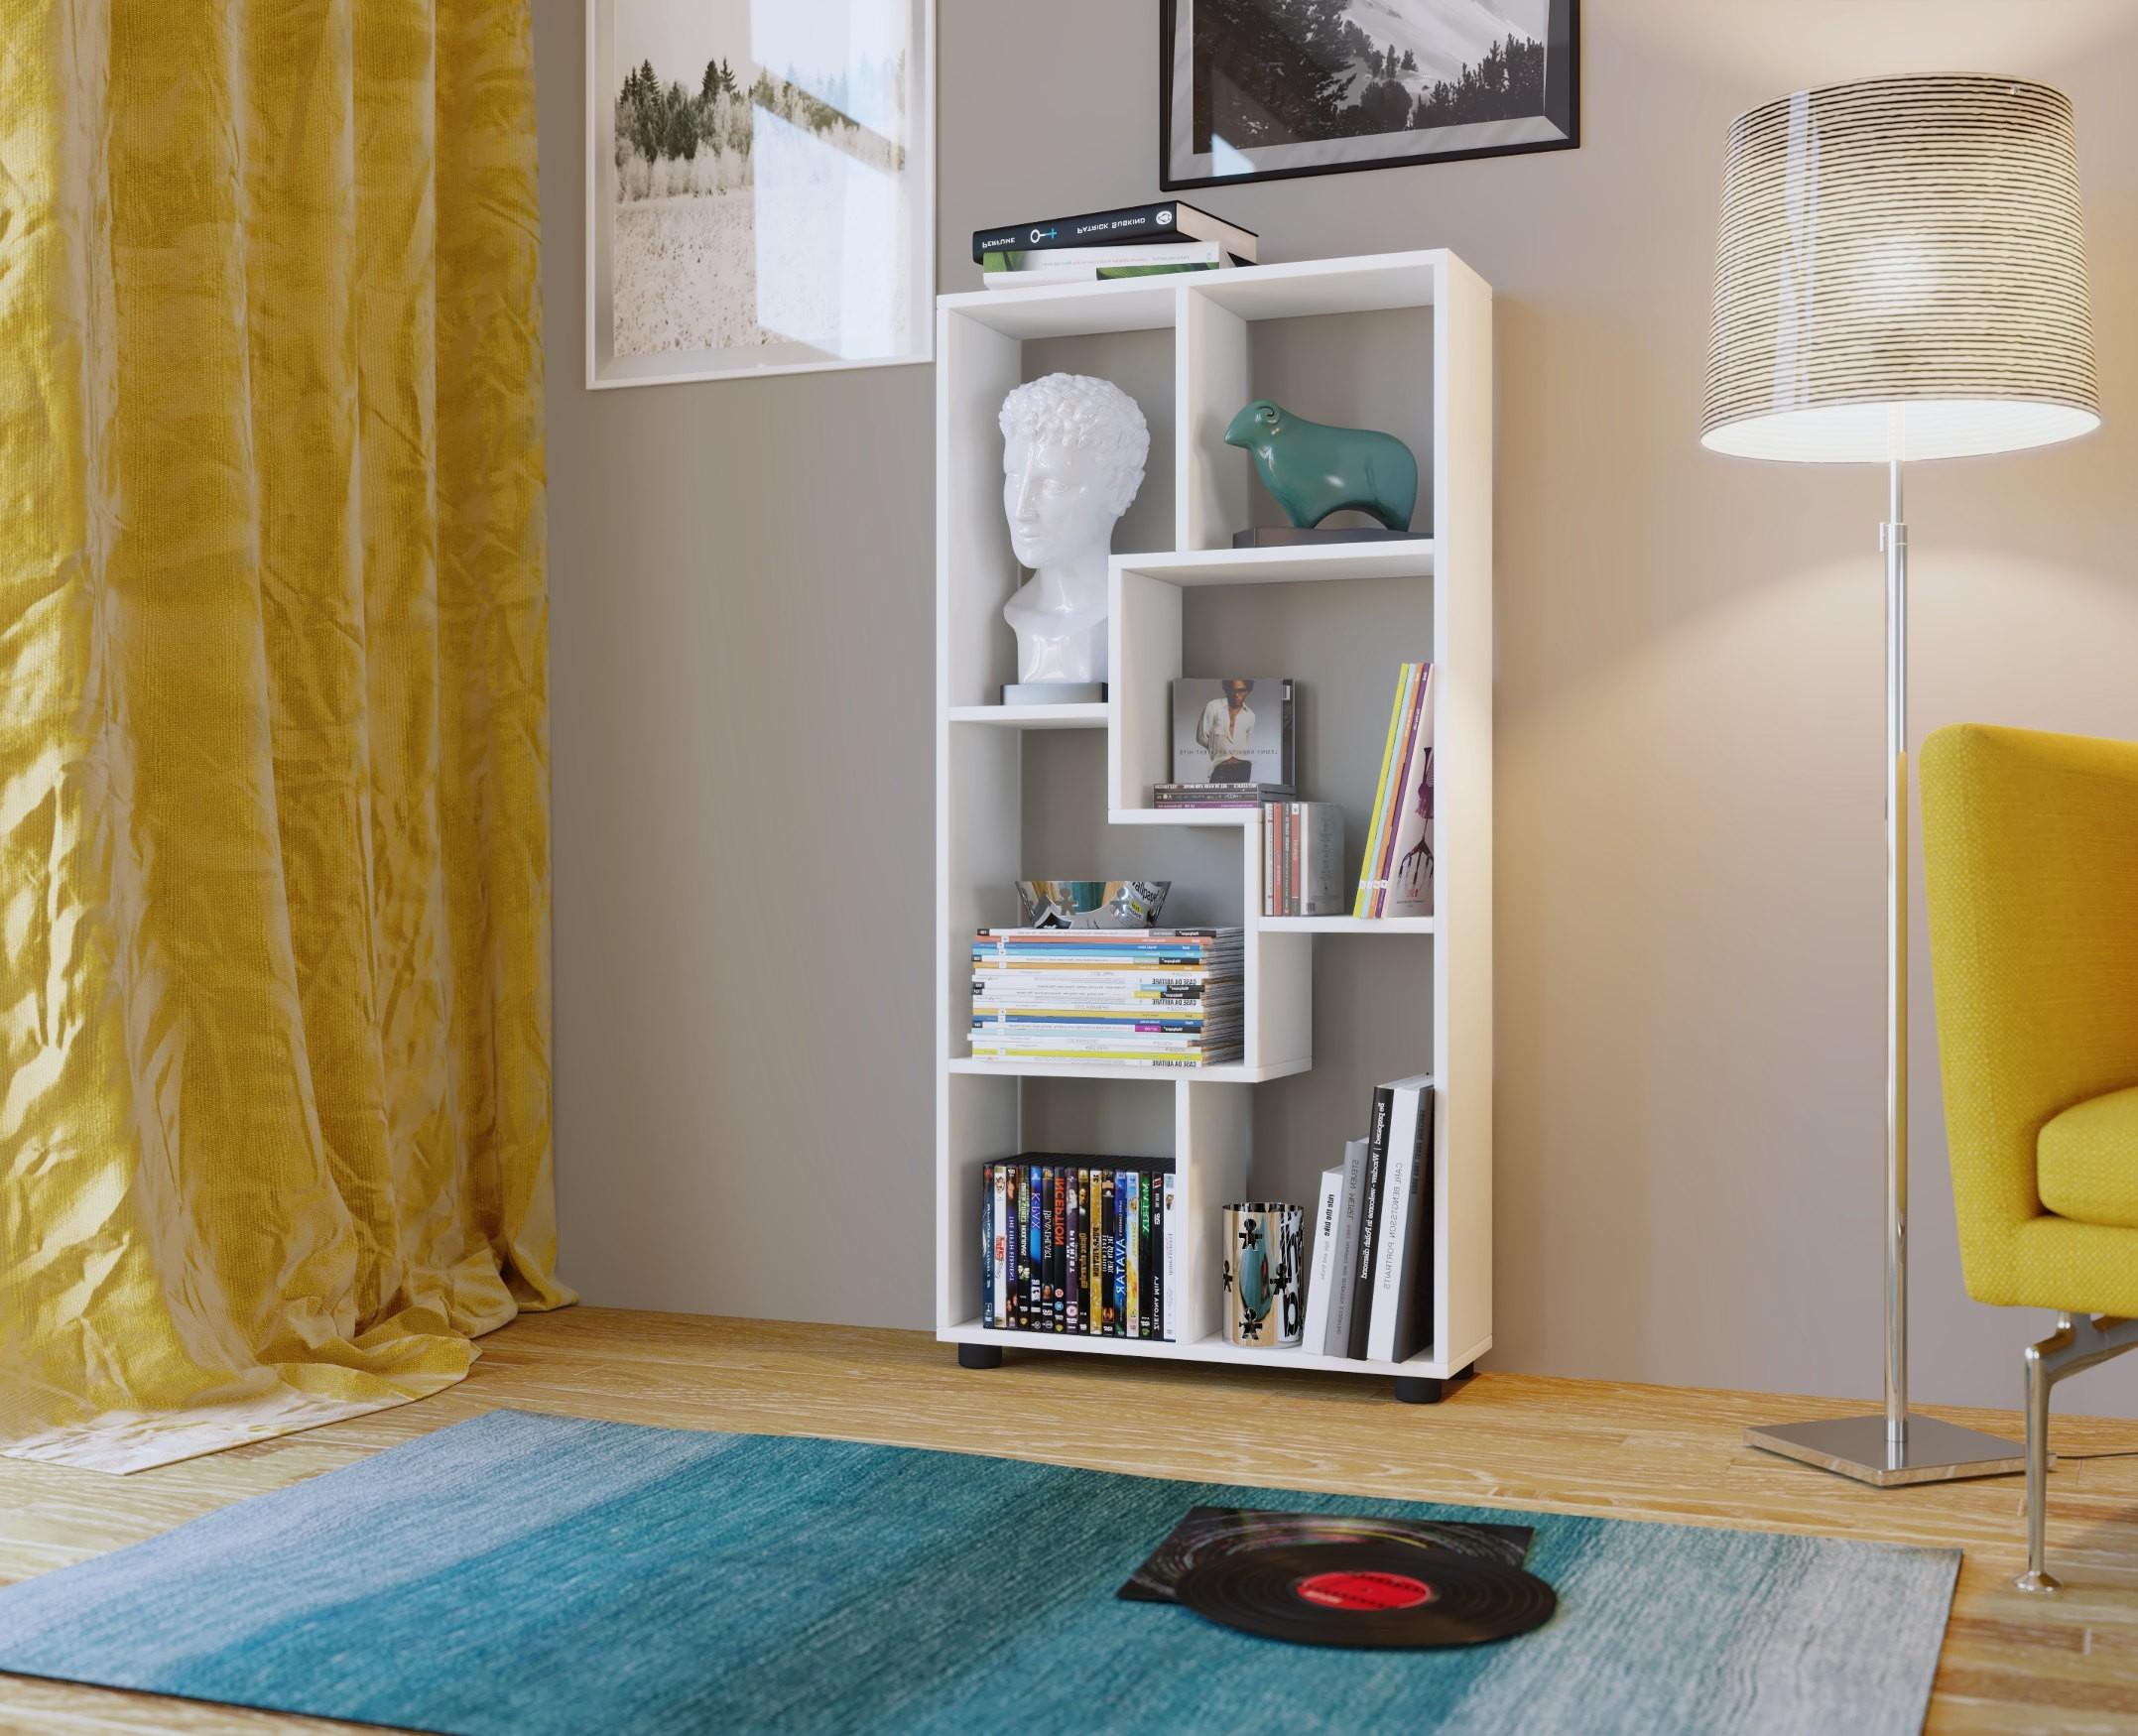 regal pisa designregal b cherregal wandregal modernes design 6 f cher weiss ebay. Black Bedroom Furniture Sets. Home Design Ideas